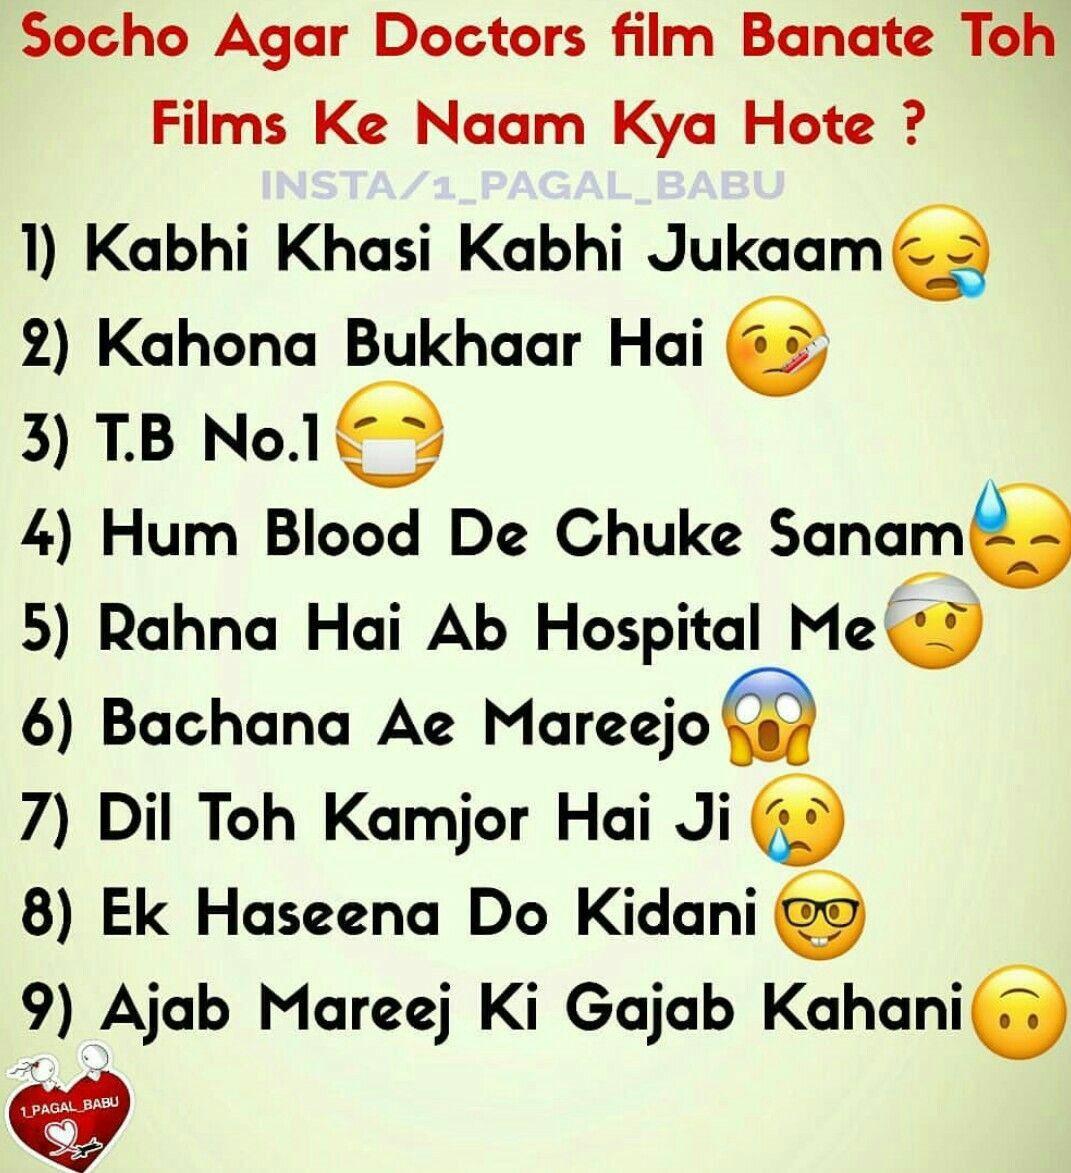 Pin By Shagufta Yasmeen On Jokes Funny Joke Quote Some Funny Jokes Fun Quotes Funny